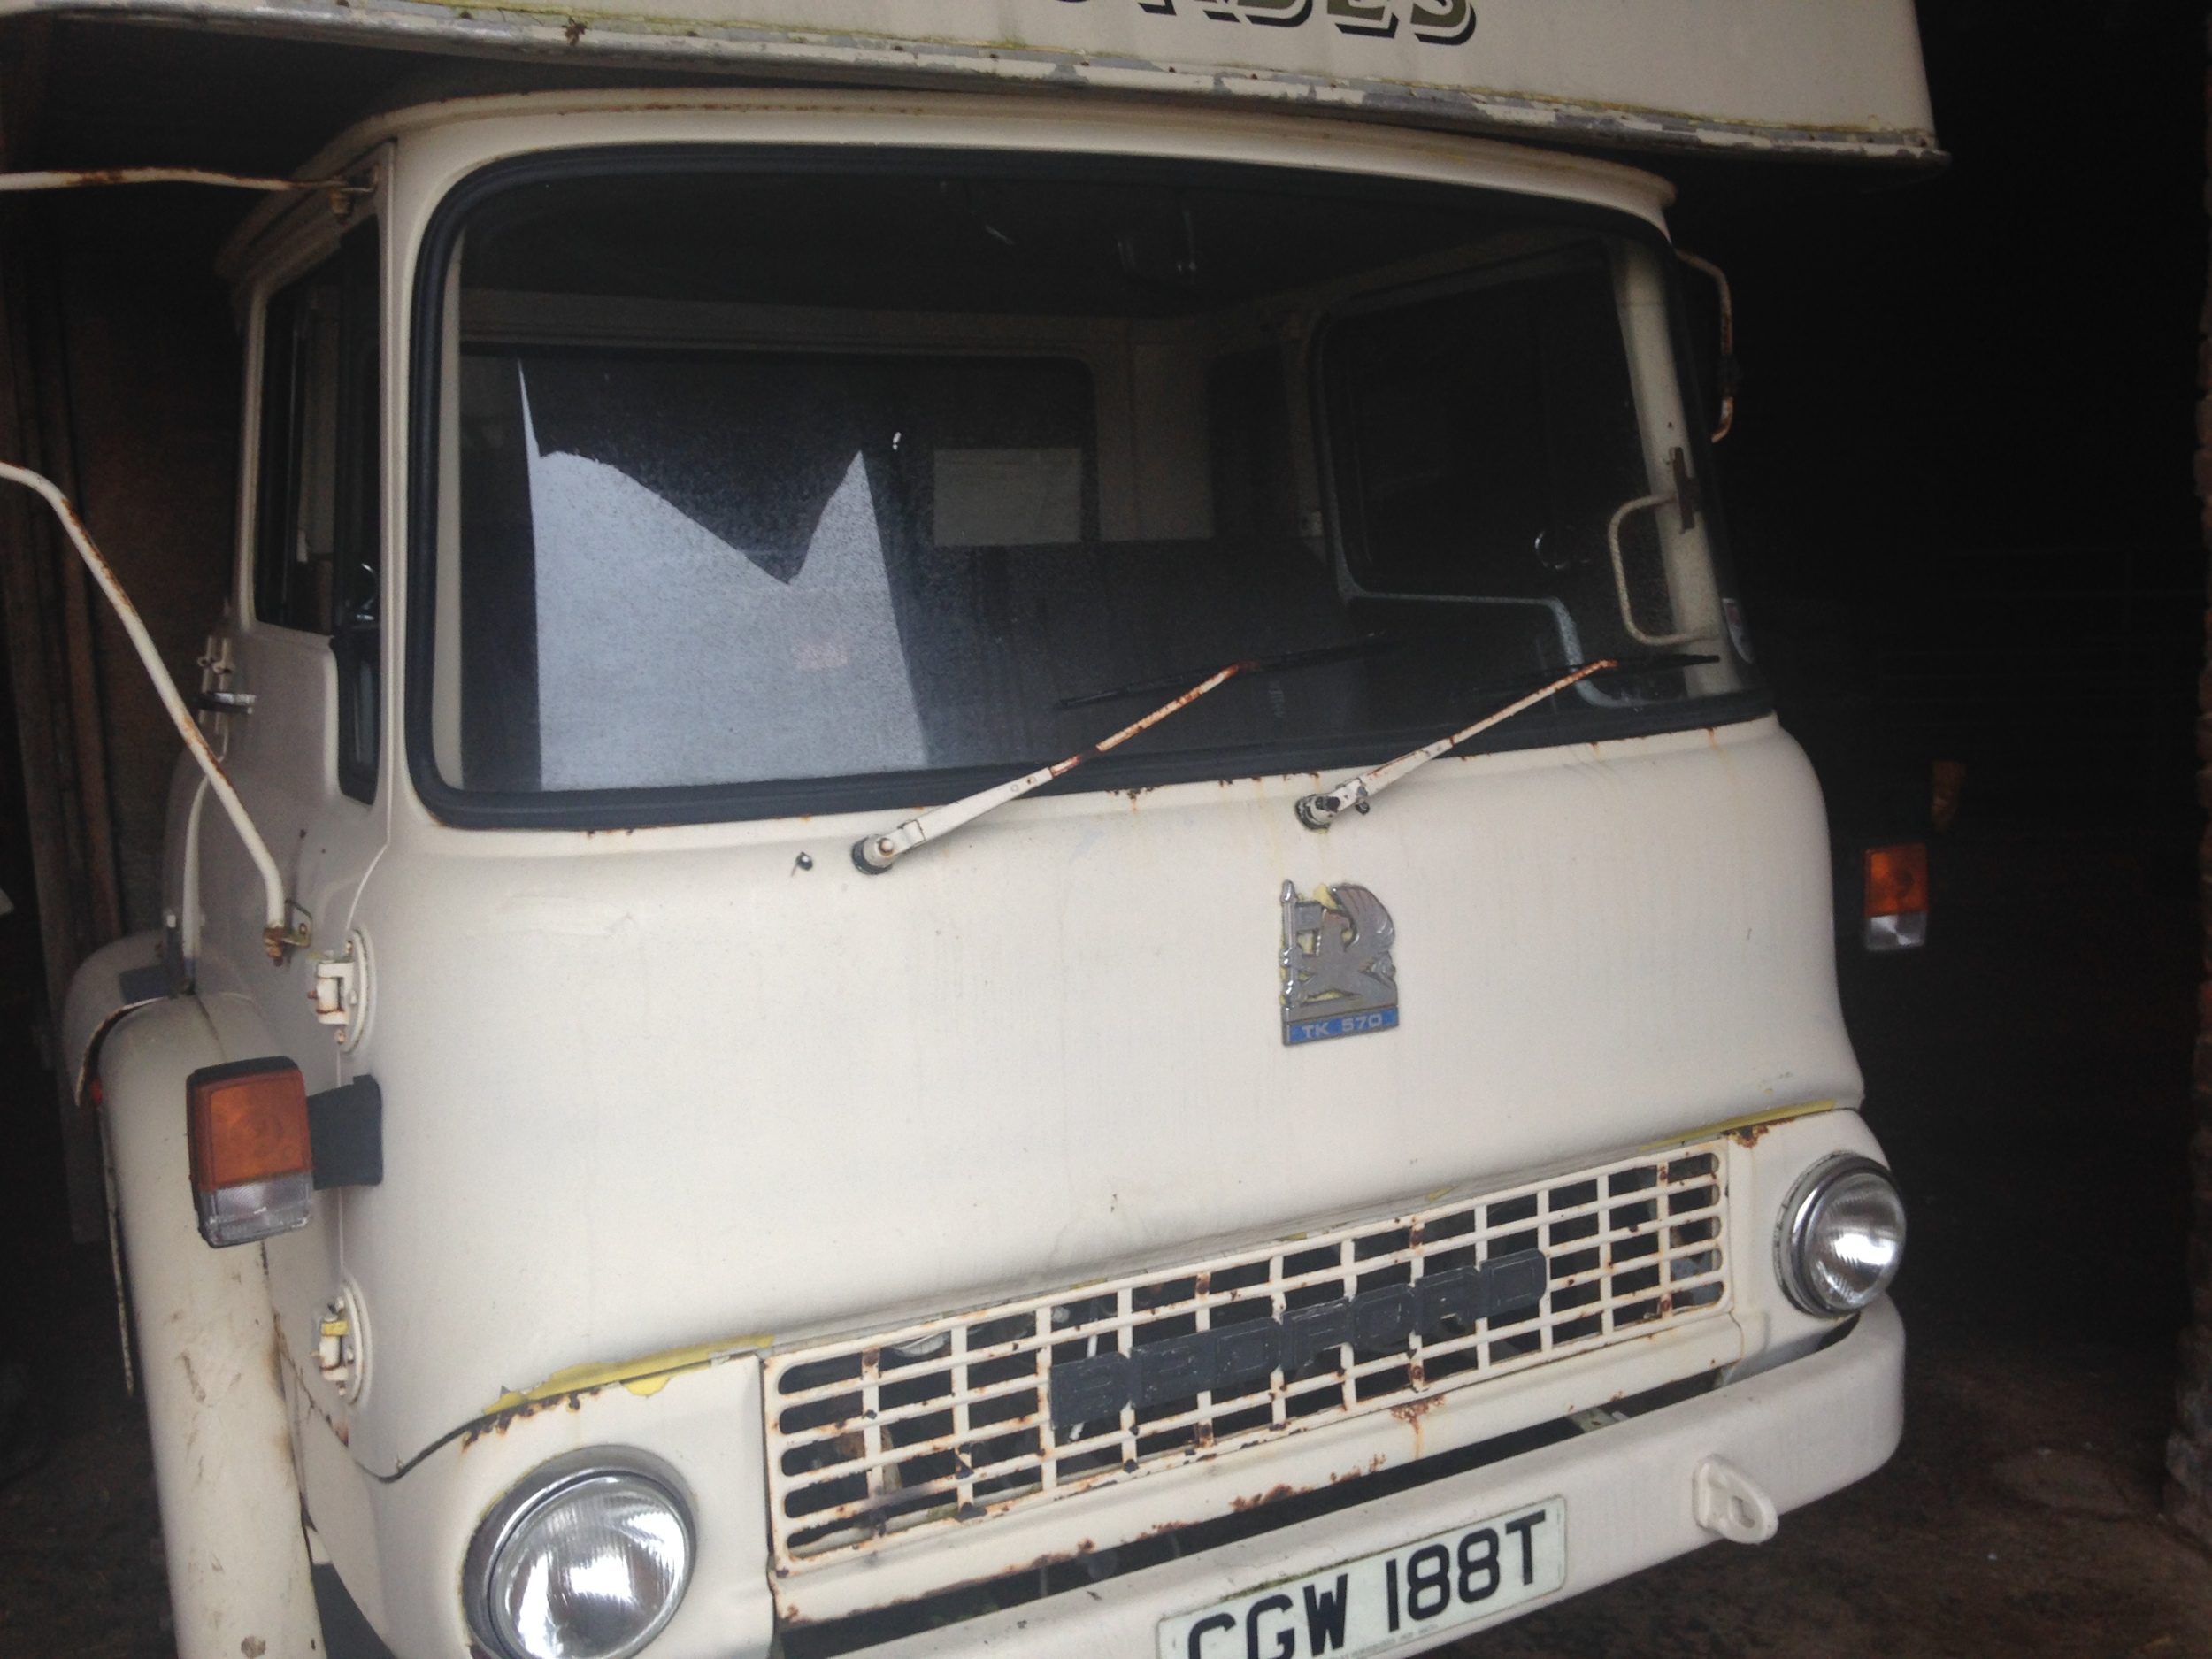 Seven Mile food truck - renovation - cab